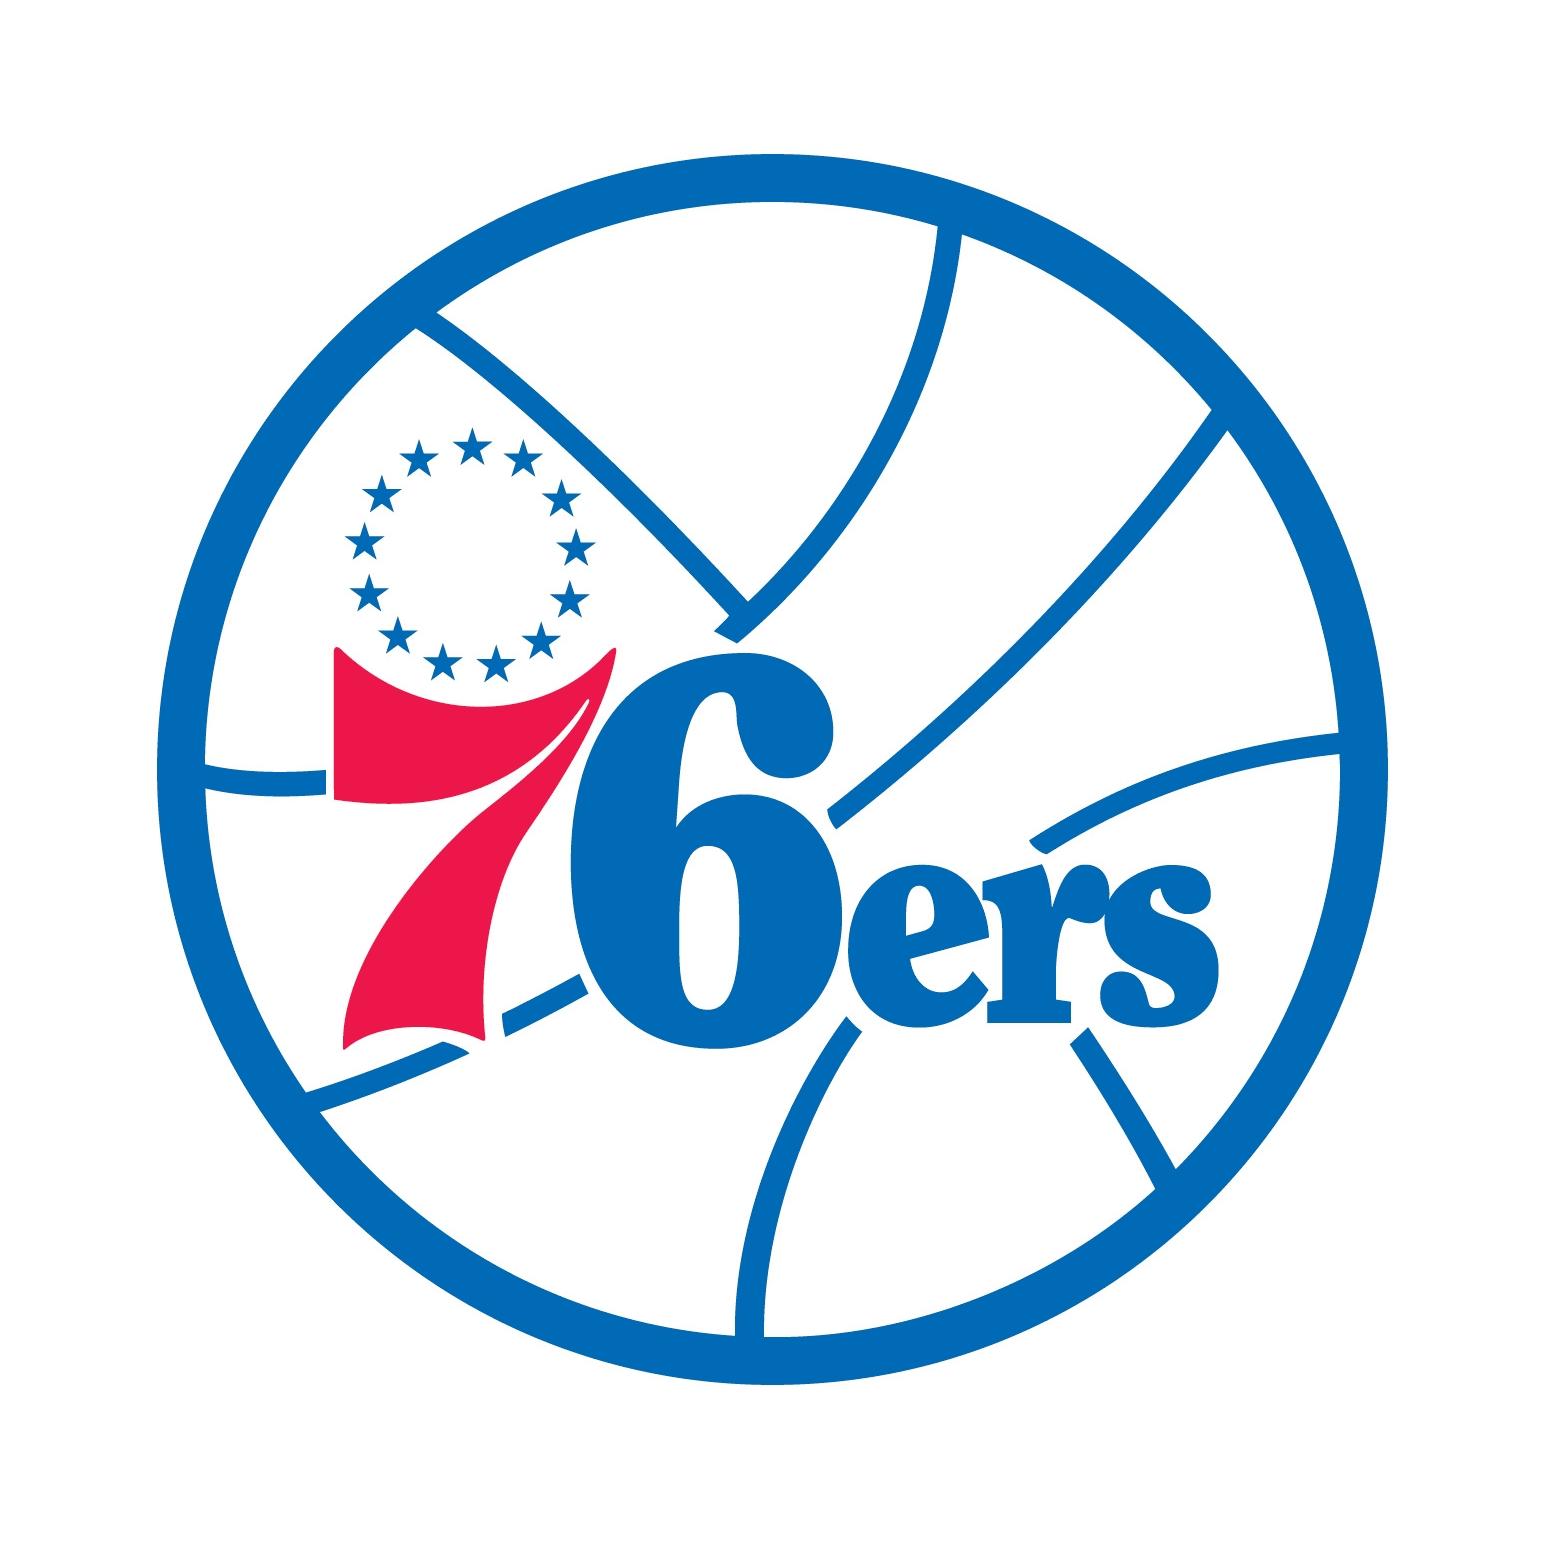 Philadelphia 76ers Logos Download